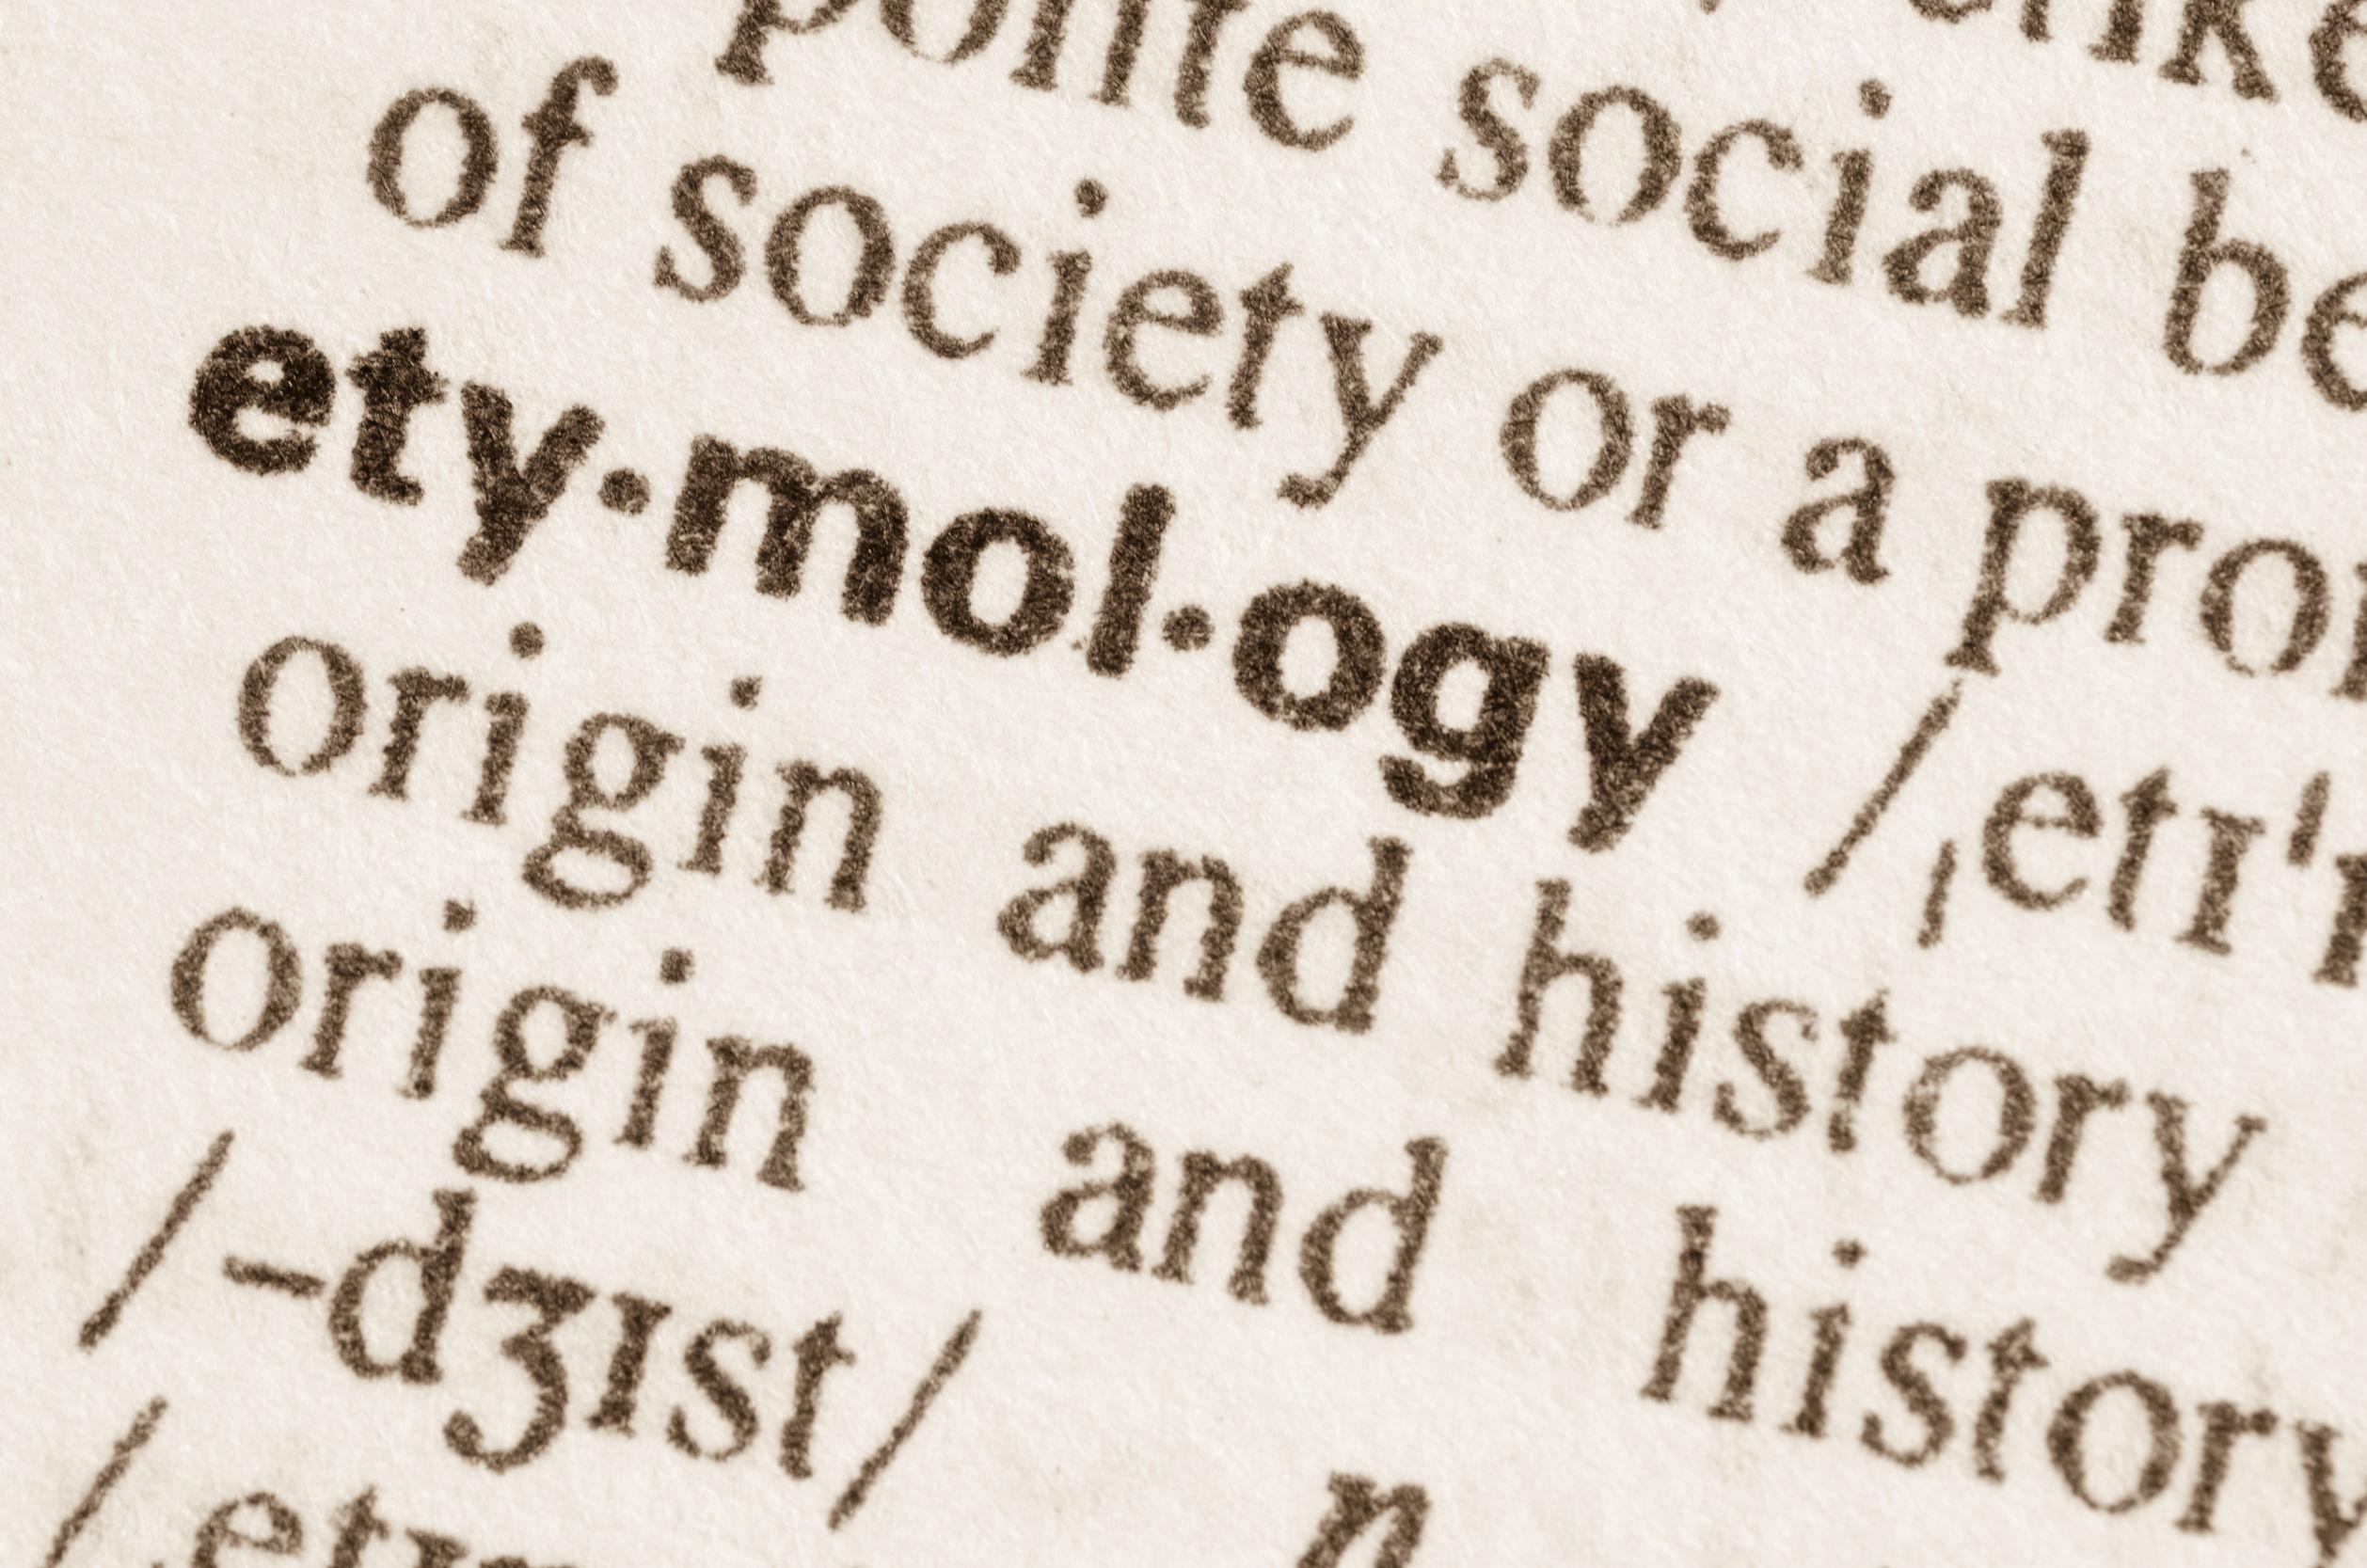 Etimologías curiosas (Parte I)